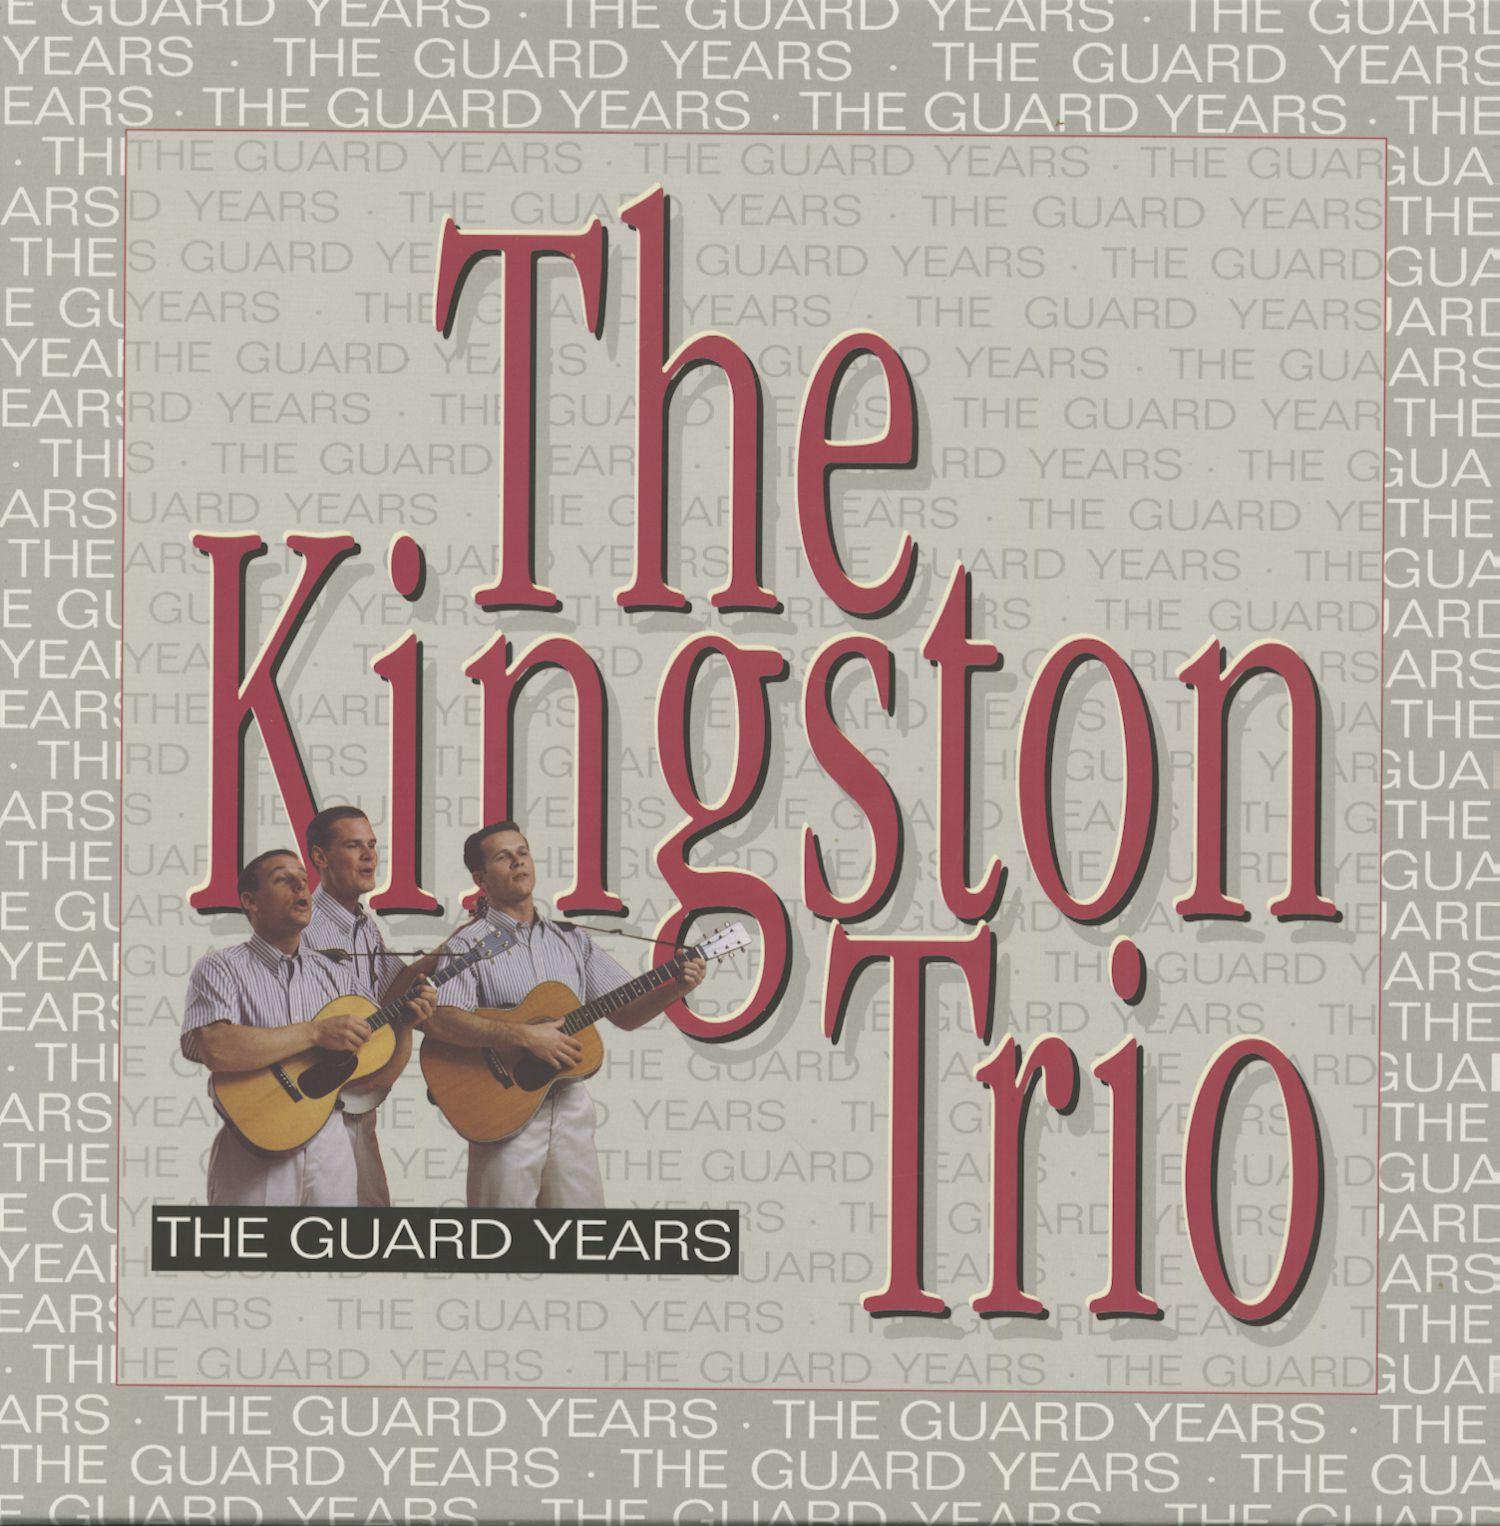 KINGSTON TRIO The Guard Years (10-CD Box Set)